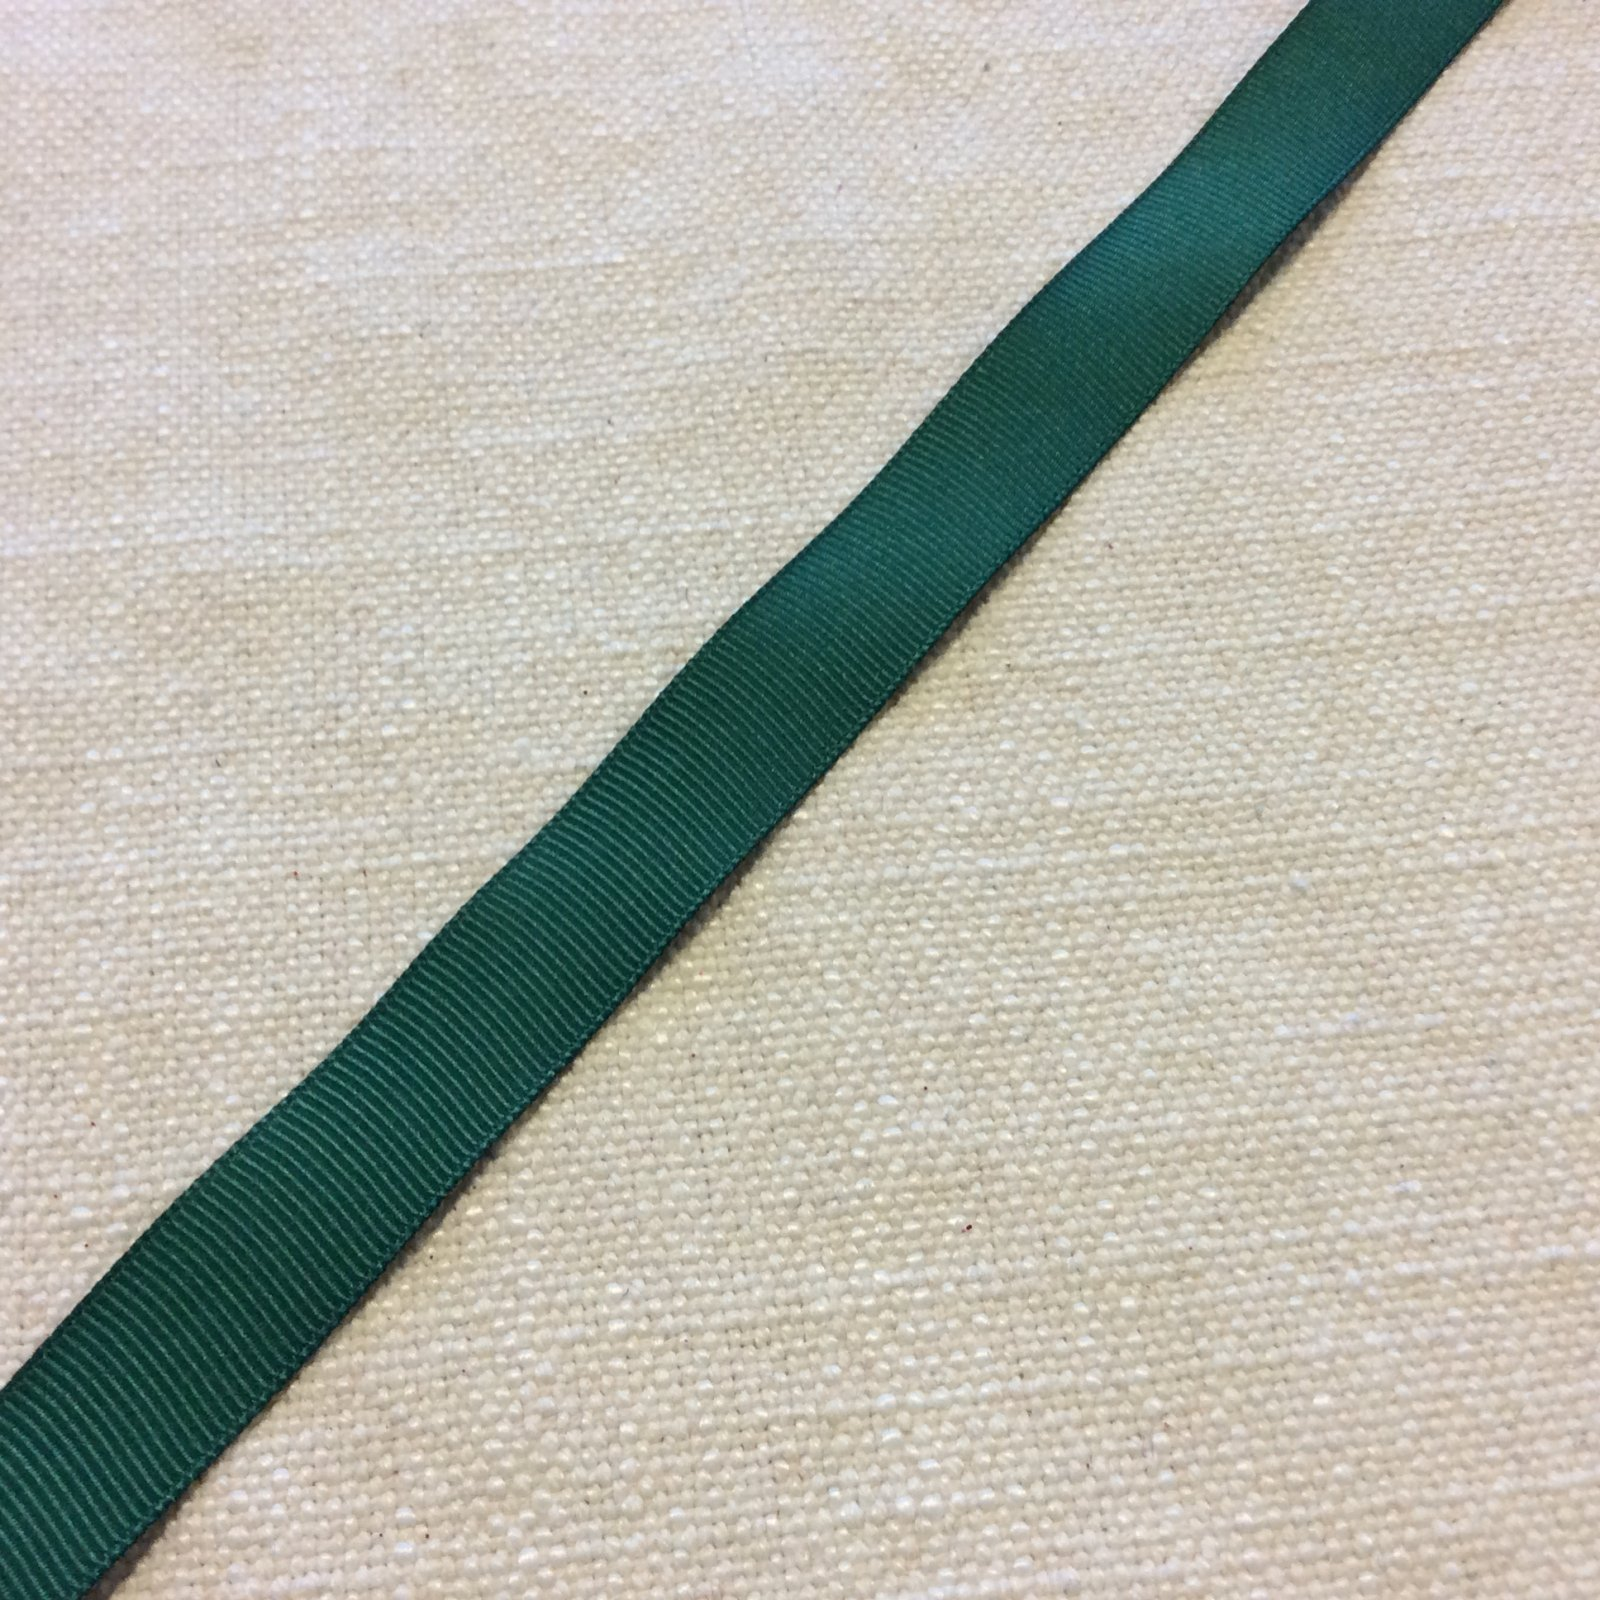 Grosgrain Ribbon Hunter Green 5/8 Trim Ribbon RIB1115